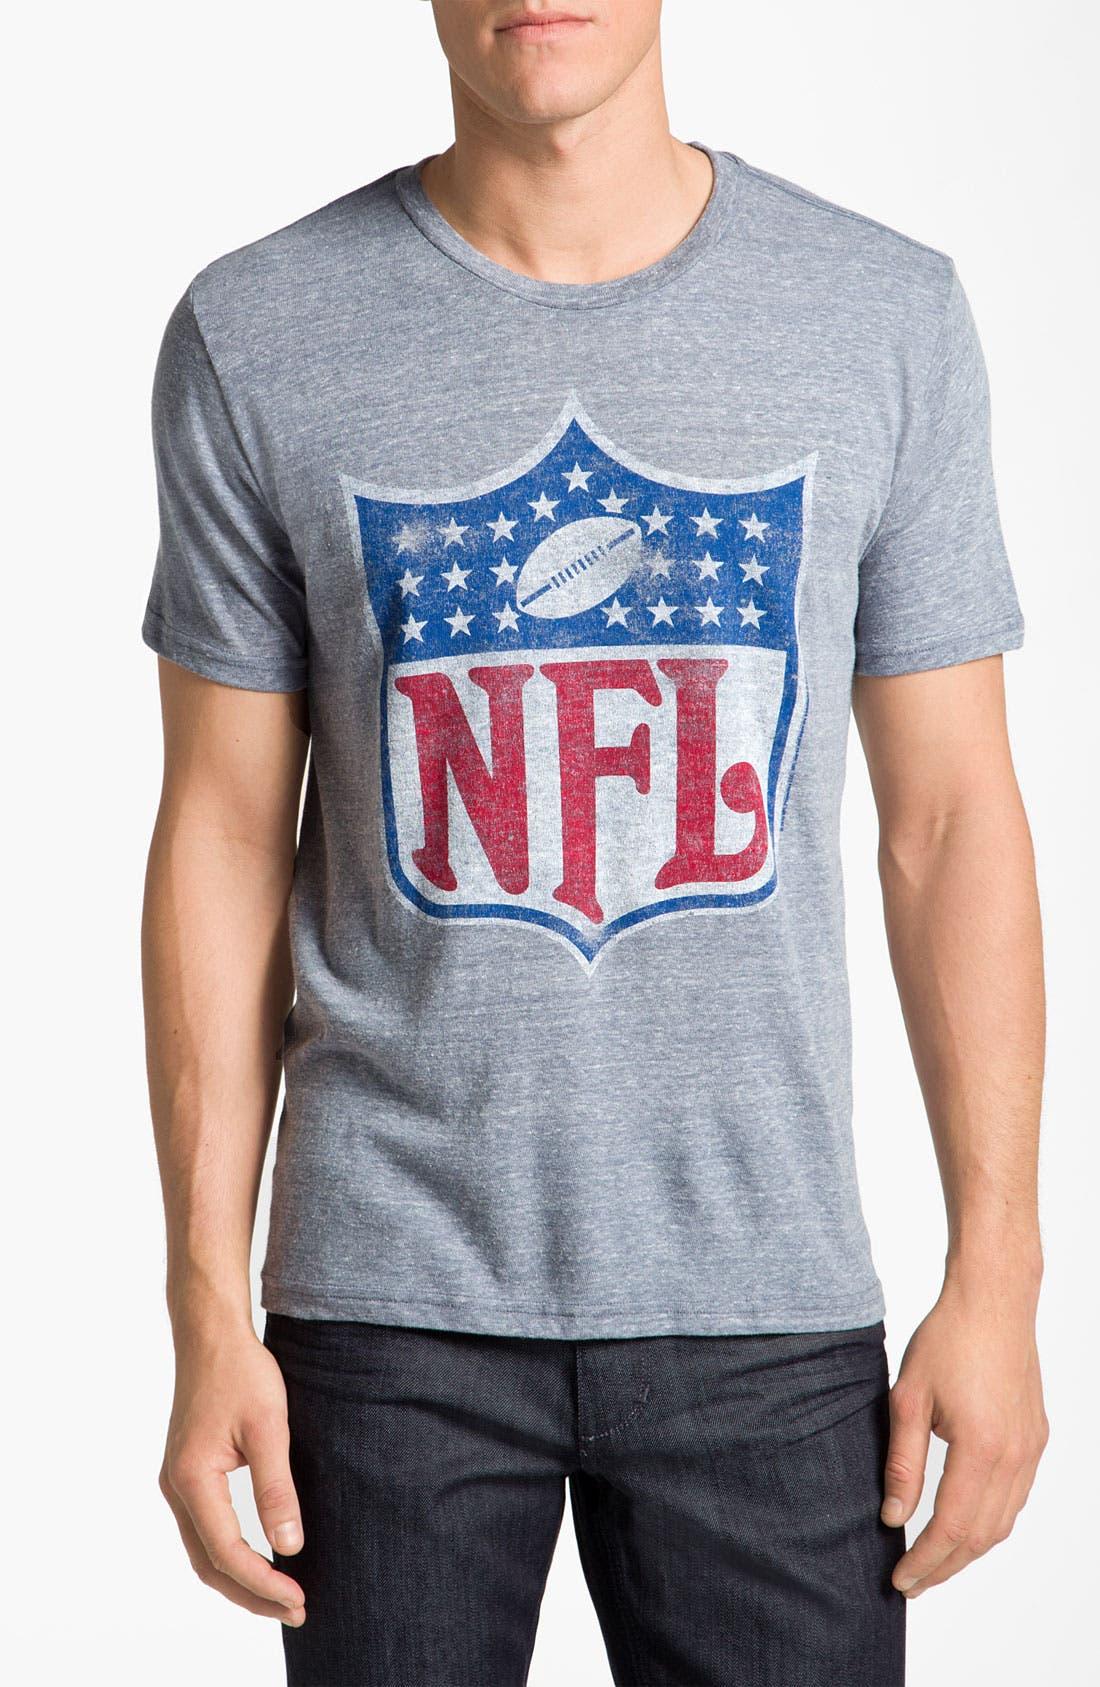 Main Image - Junk Food NFL Shield Graphic Crewneck T-Shirt